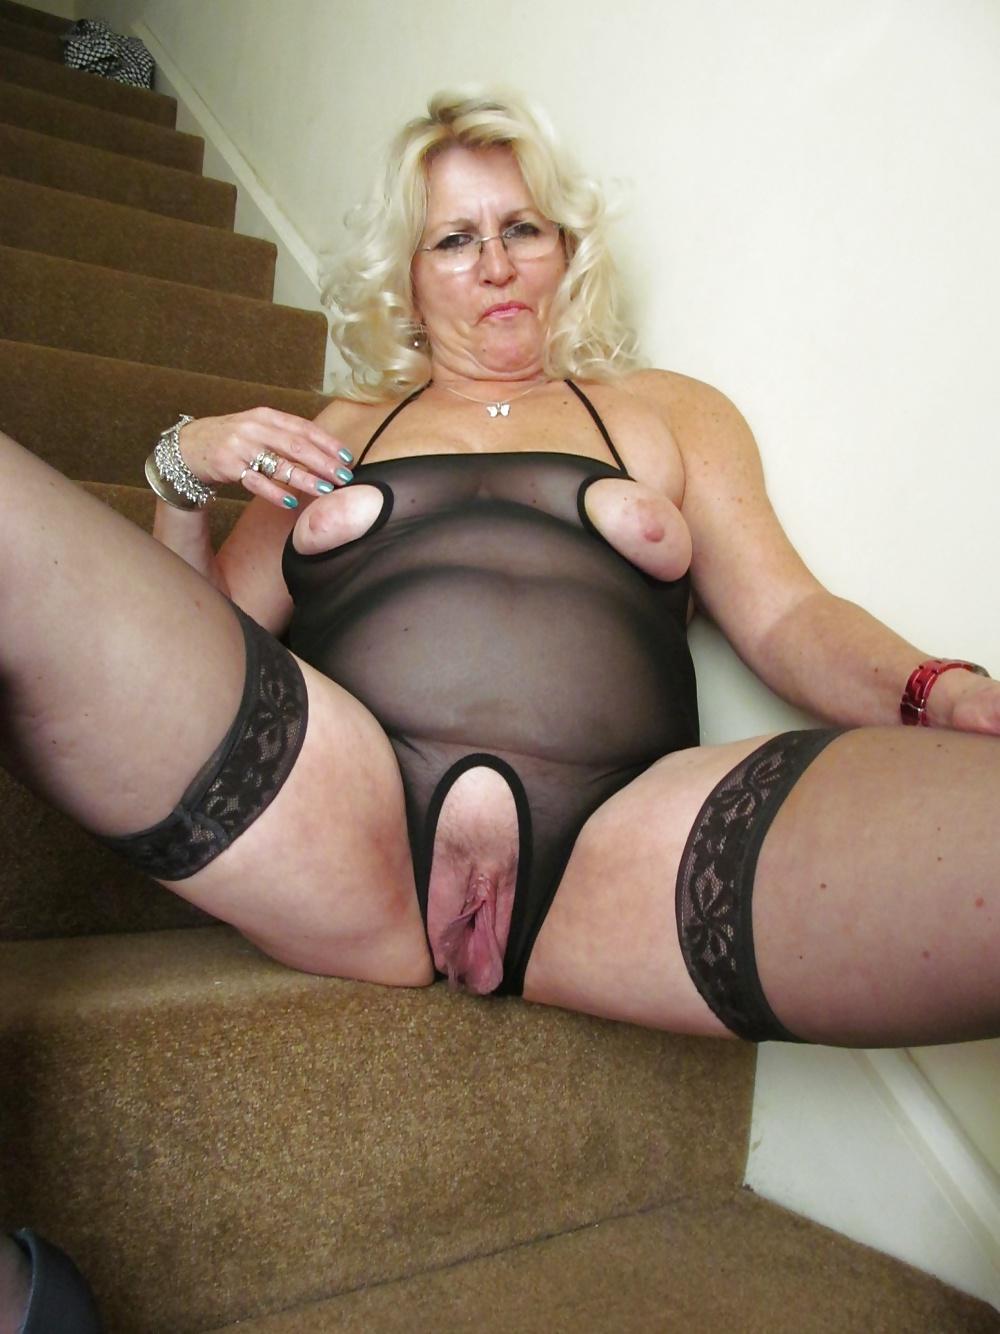 crotchless mature pics xhamster com